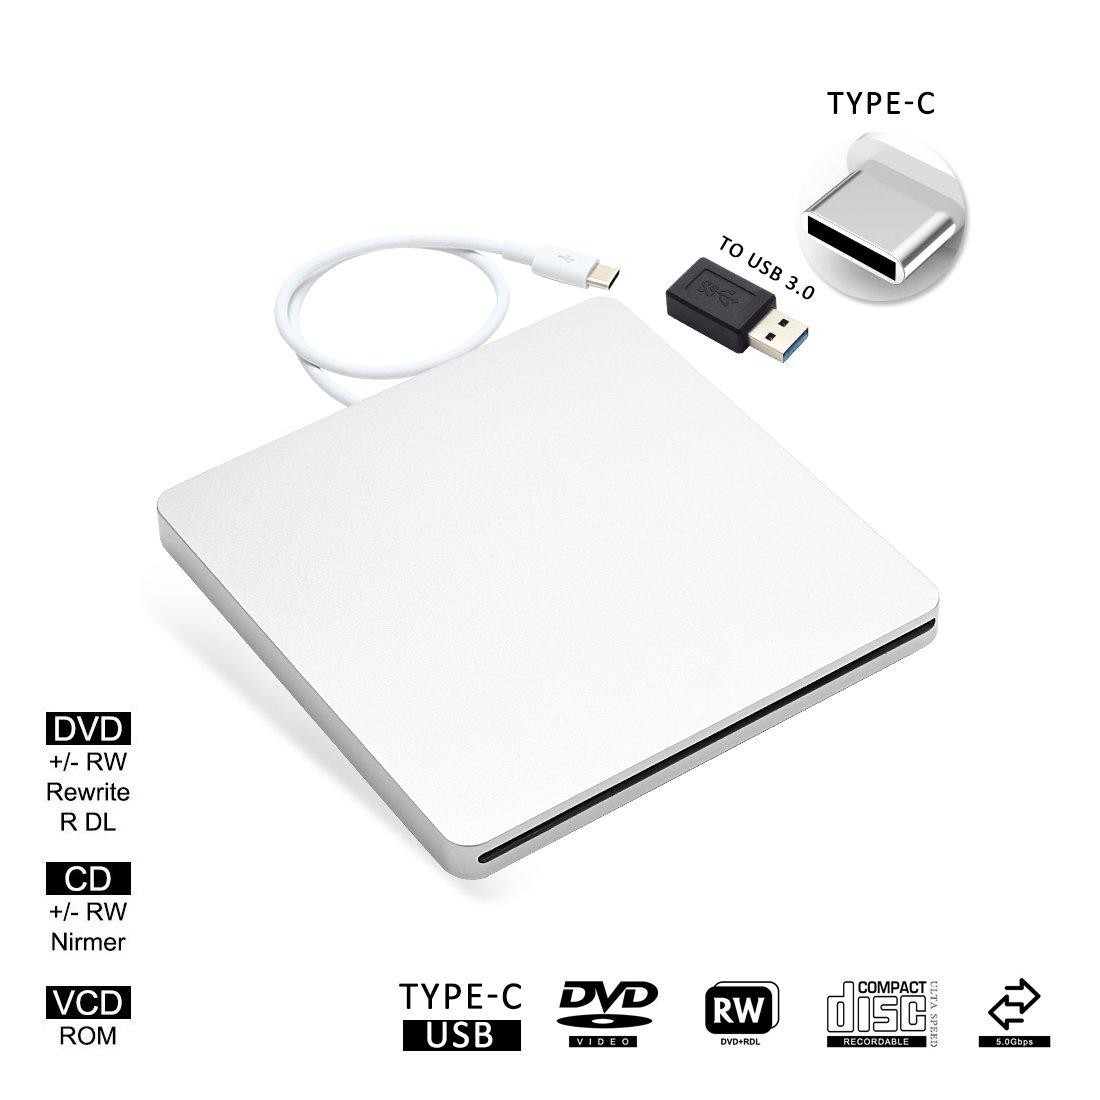 USB-C Superdrive External Drive Burner DVD CD VCD Reader +/- RW Rewriter/Writer/Player with High Speed Data for latest Mac/MacBook Pro/Laptop/Desktop Support Windows/Mac OSX (silver)